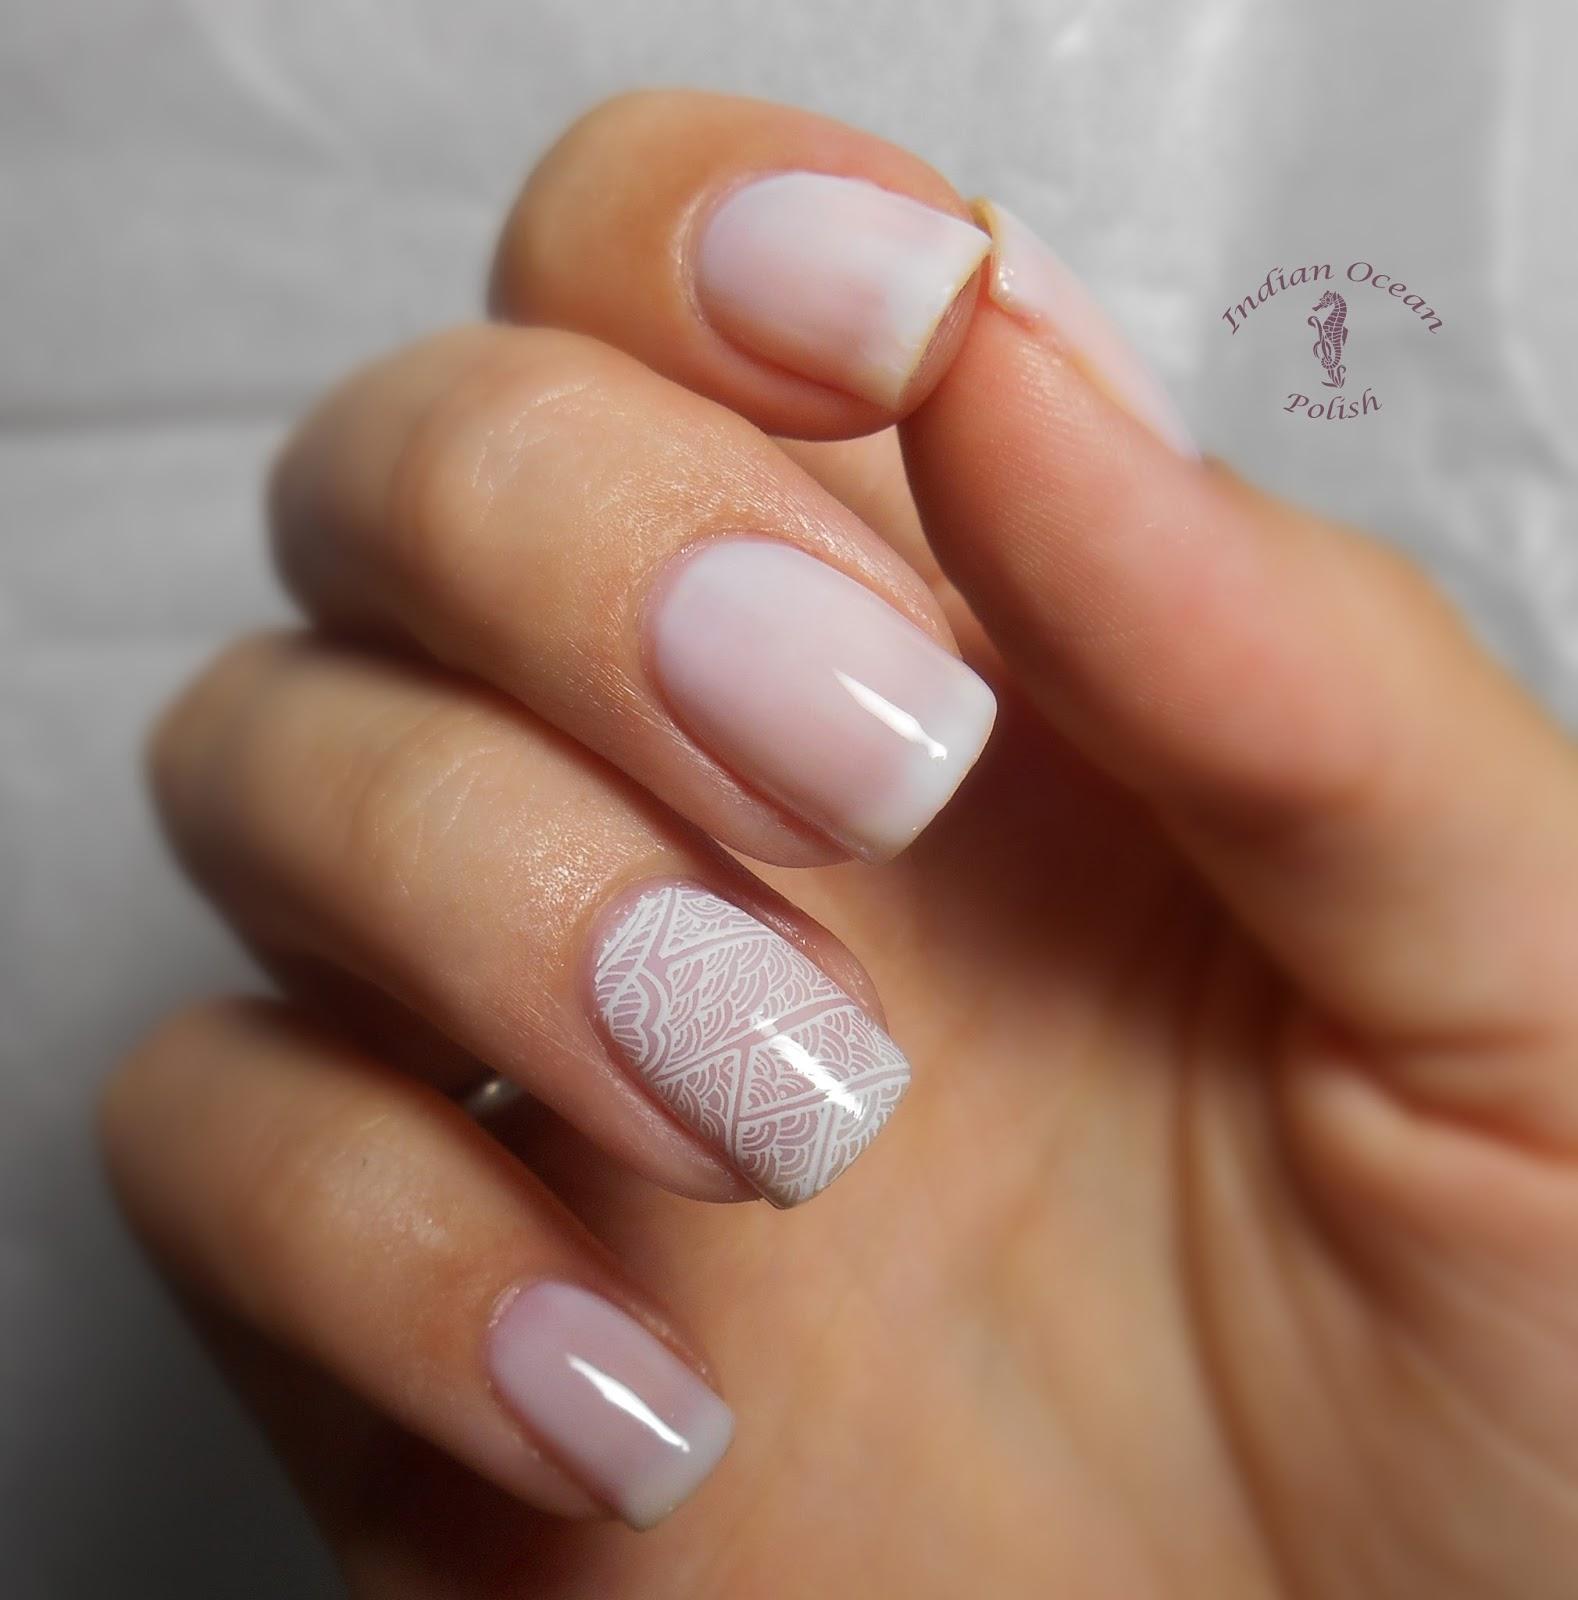 Indian Ocean Polish: Bridal Nails Special